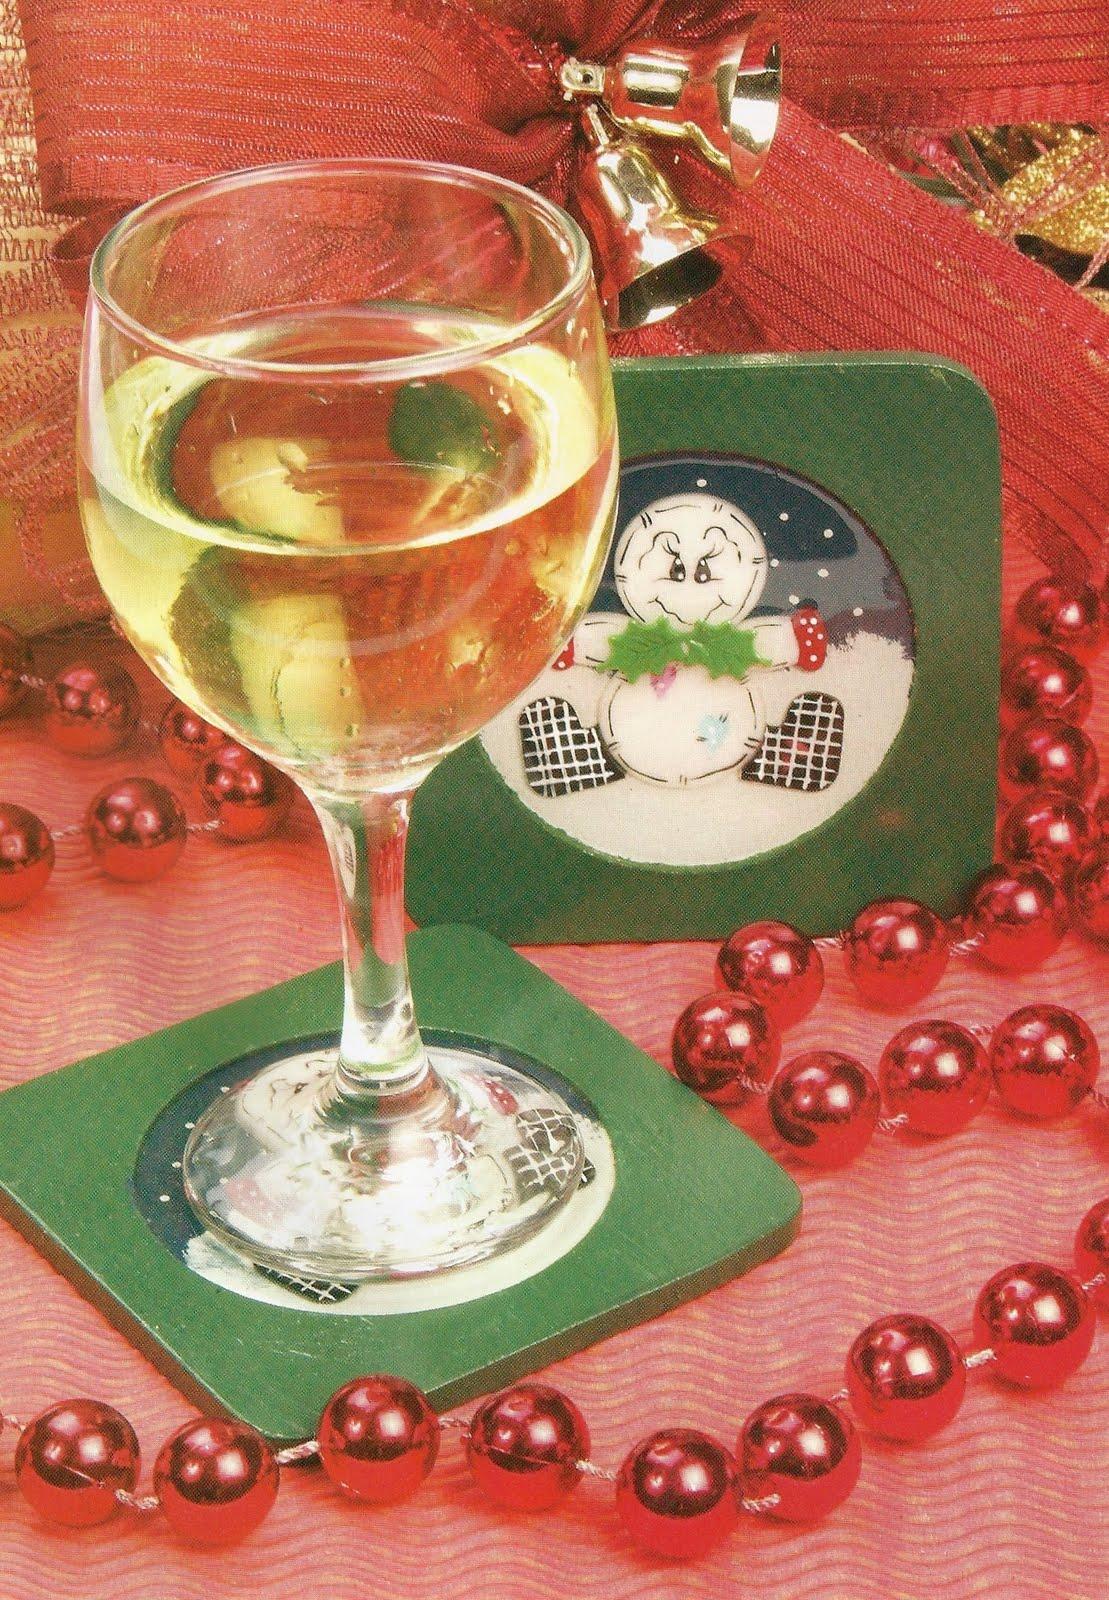 Detodomanualidades como hacer posavasos navide os - Como hacer posavasos ...